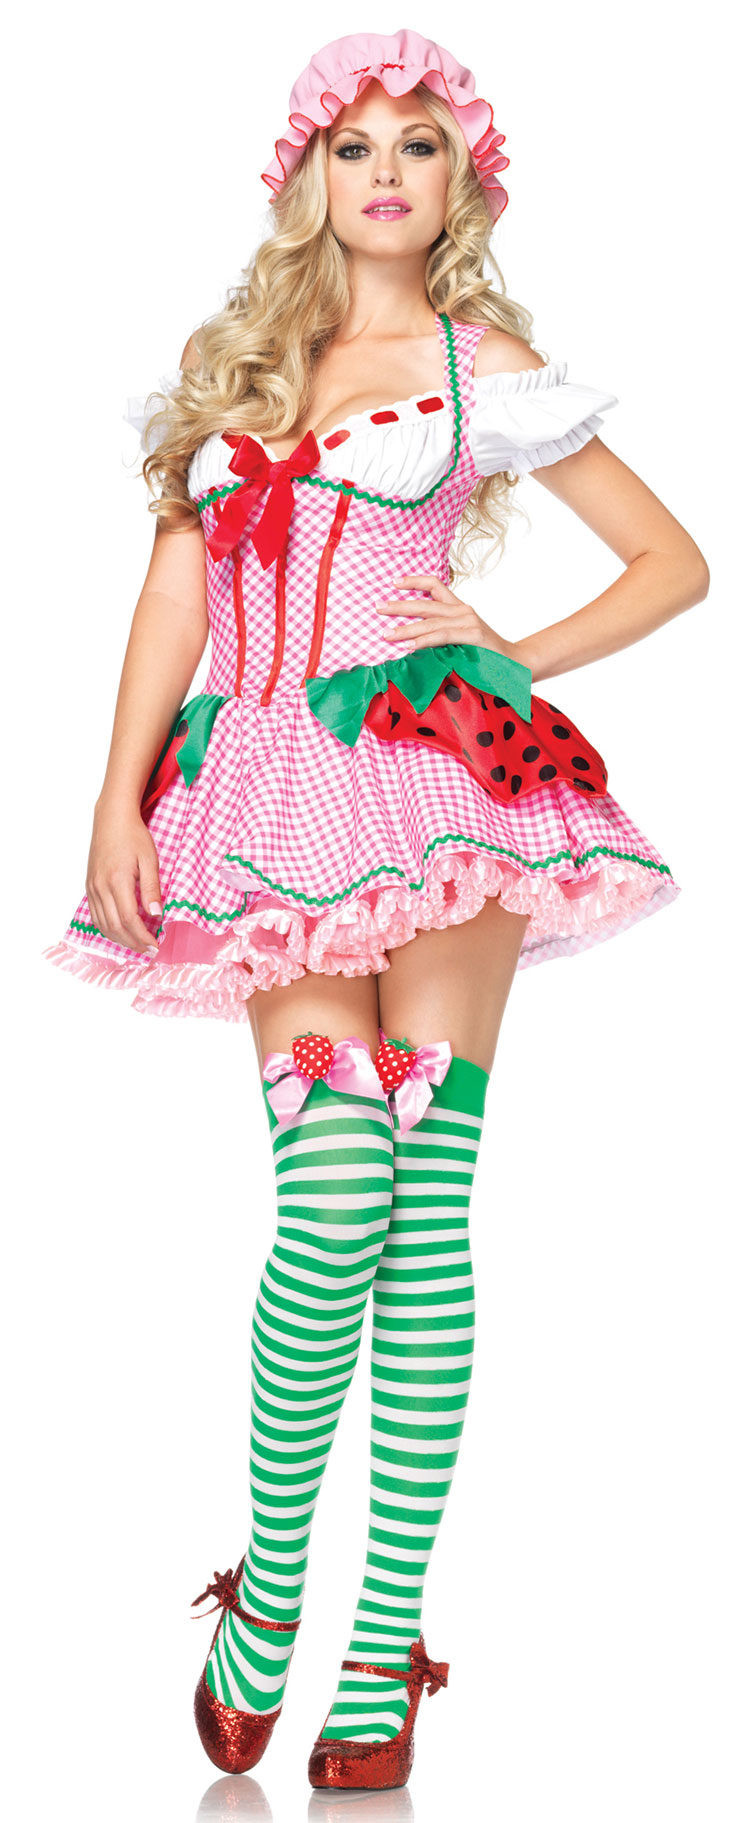 Strawberry Shortcake Haloween Costume  Strawberry Beauty Adult Costume Mr Costumes